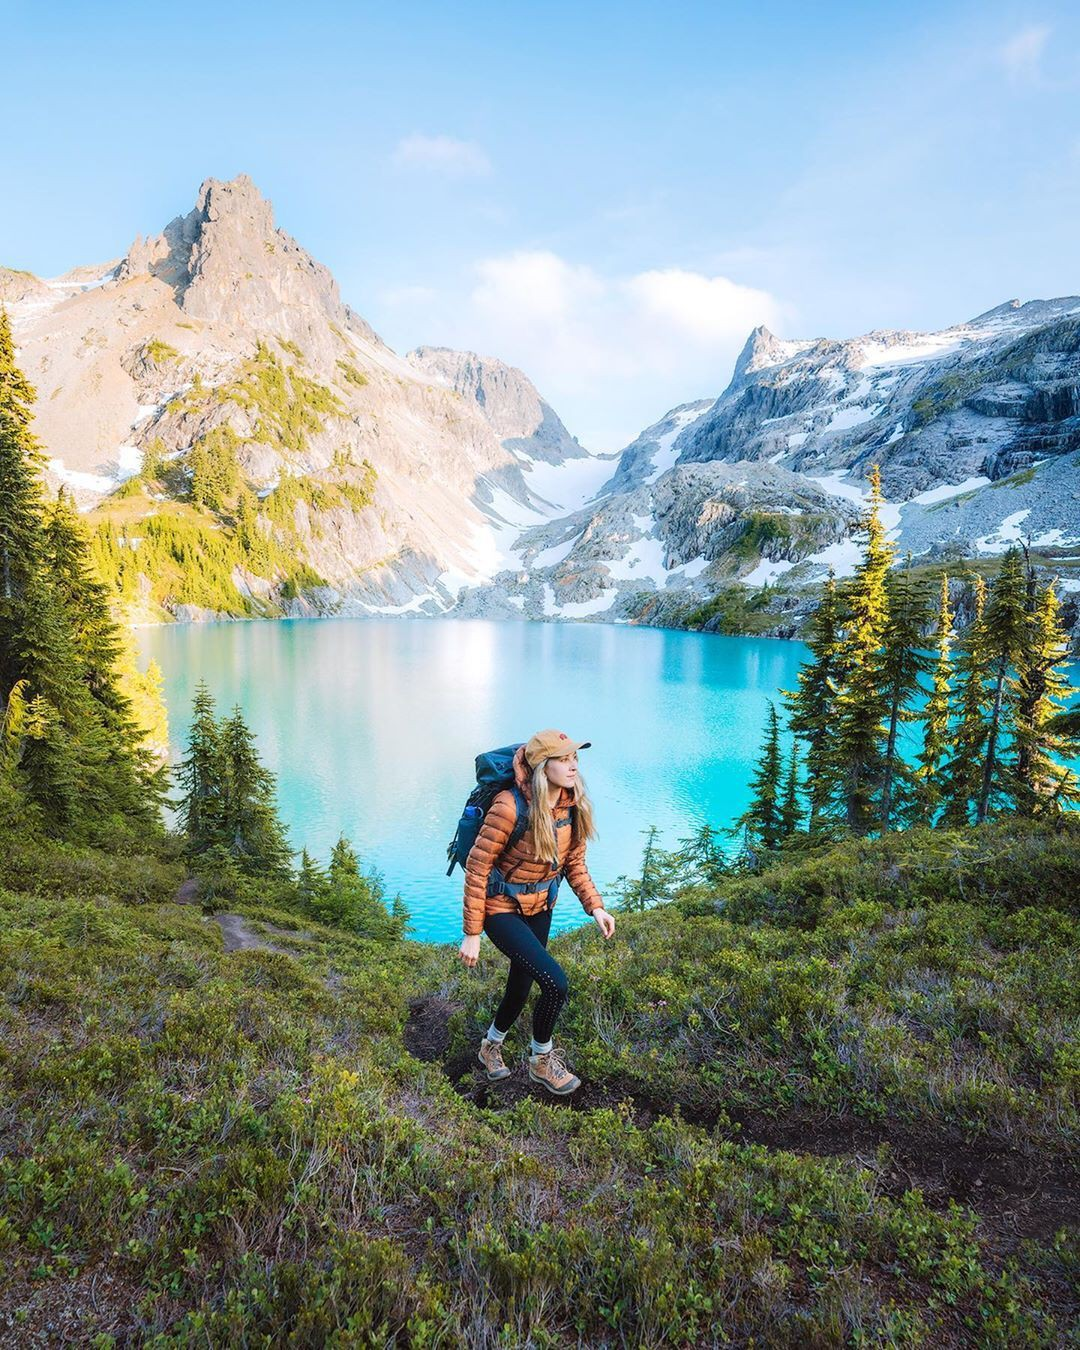 Dresses ideas nature, people in nature, mountainous landforms